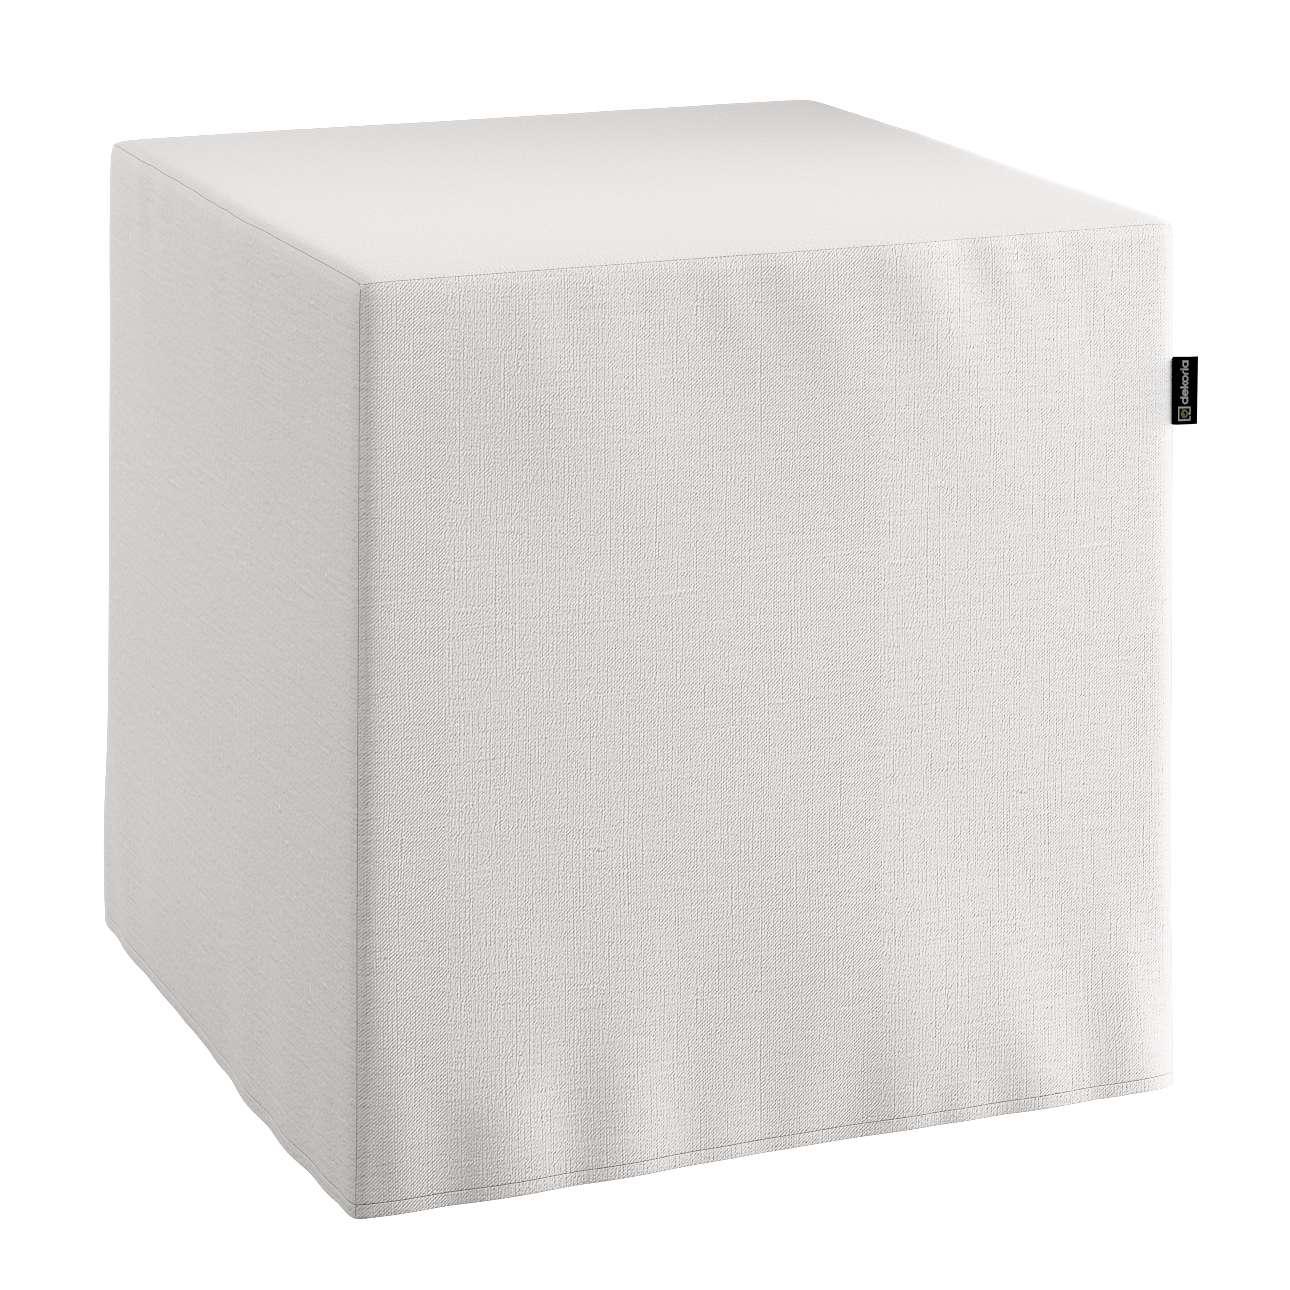 Siddepuf 40 × 40 × 40 cm fra kollektionen Linen, Stof: 392-04